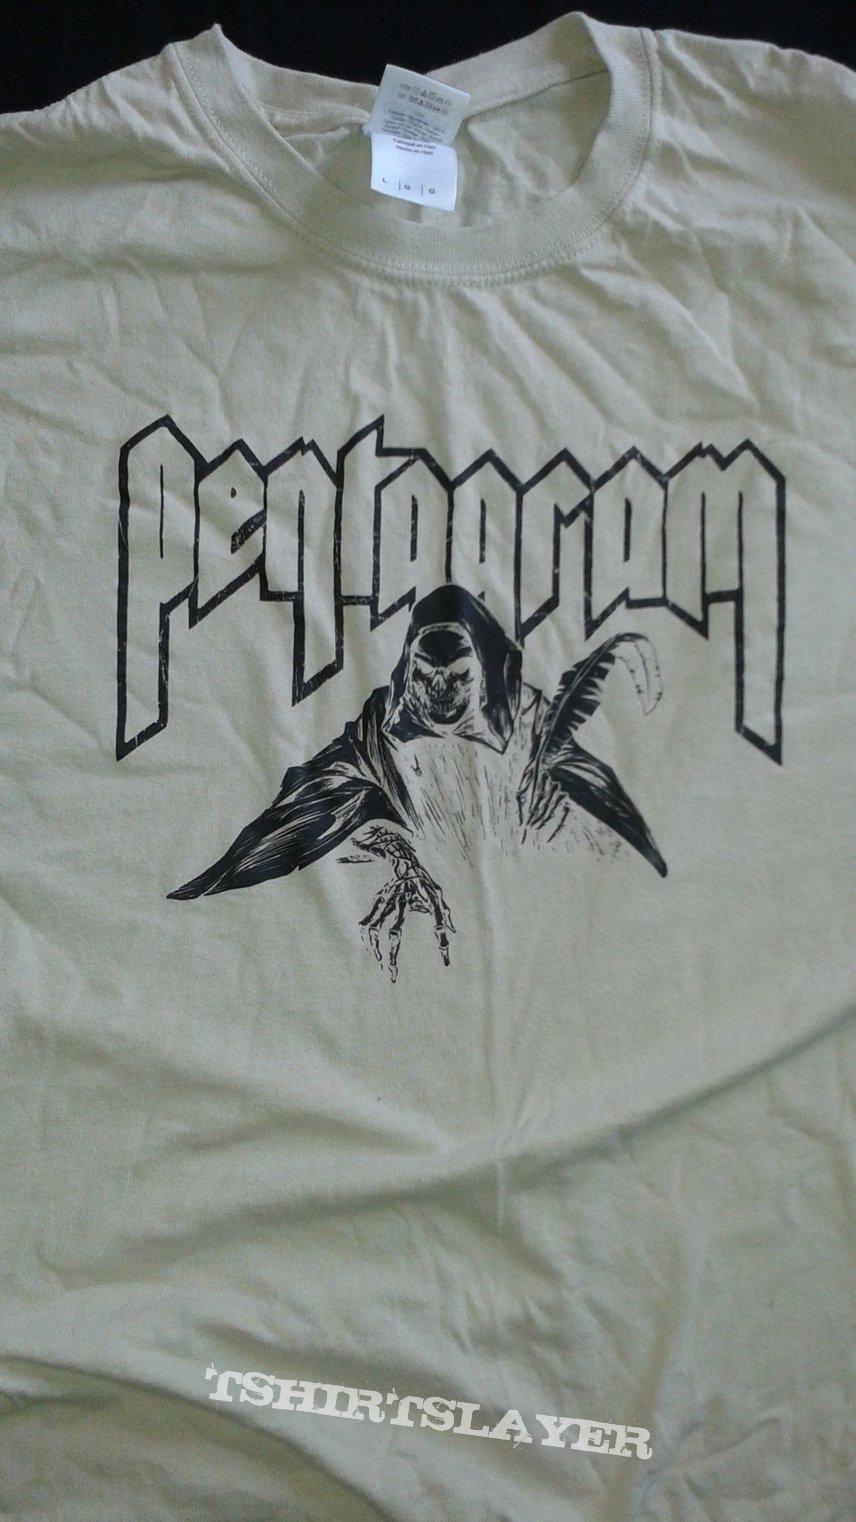 Pentagram 2014 tour shirt.